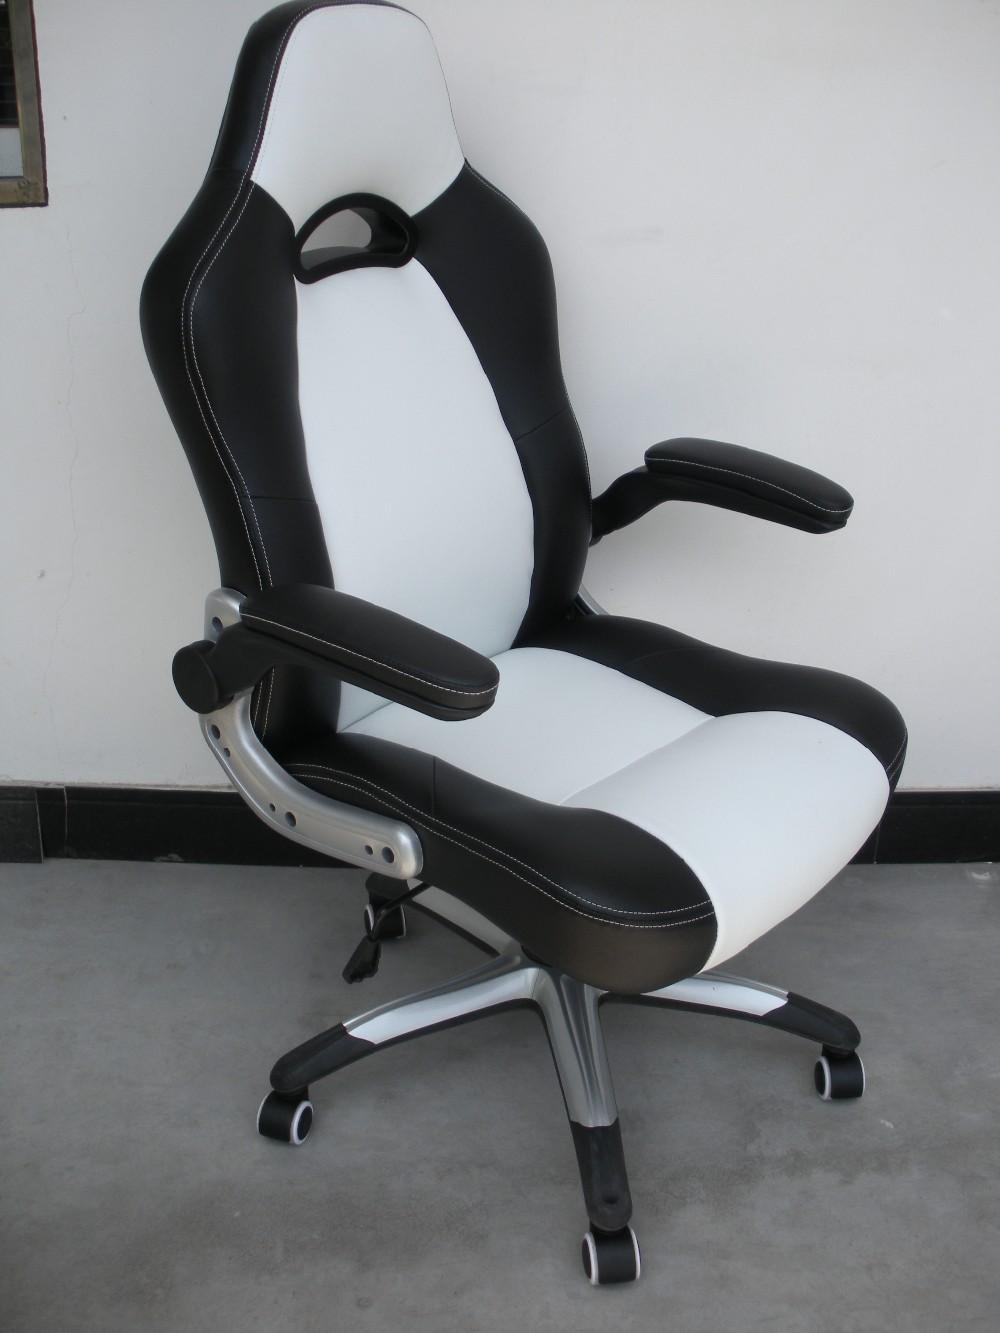 Zhenhong 2016 Akracing Gaming Chair Office Chair/ak Racing Chair ...